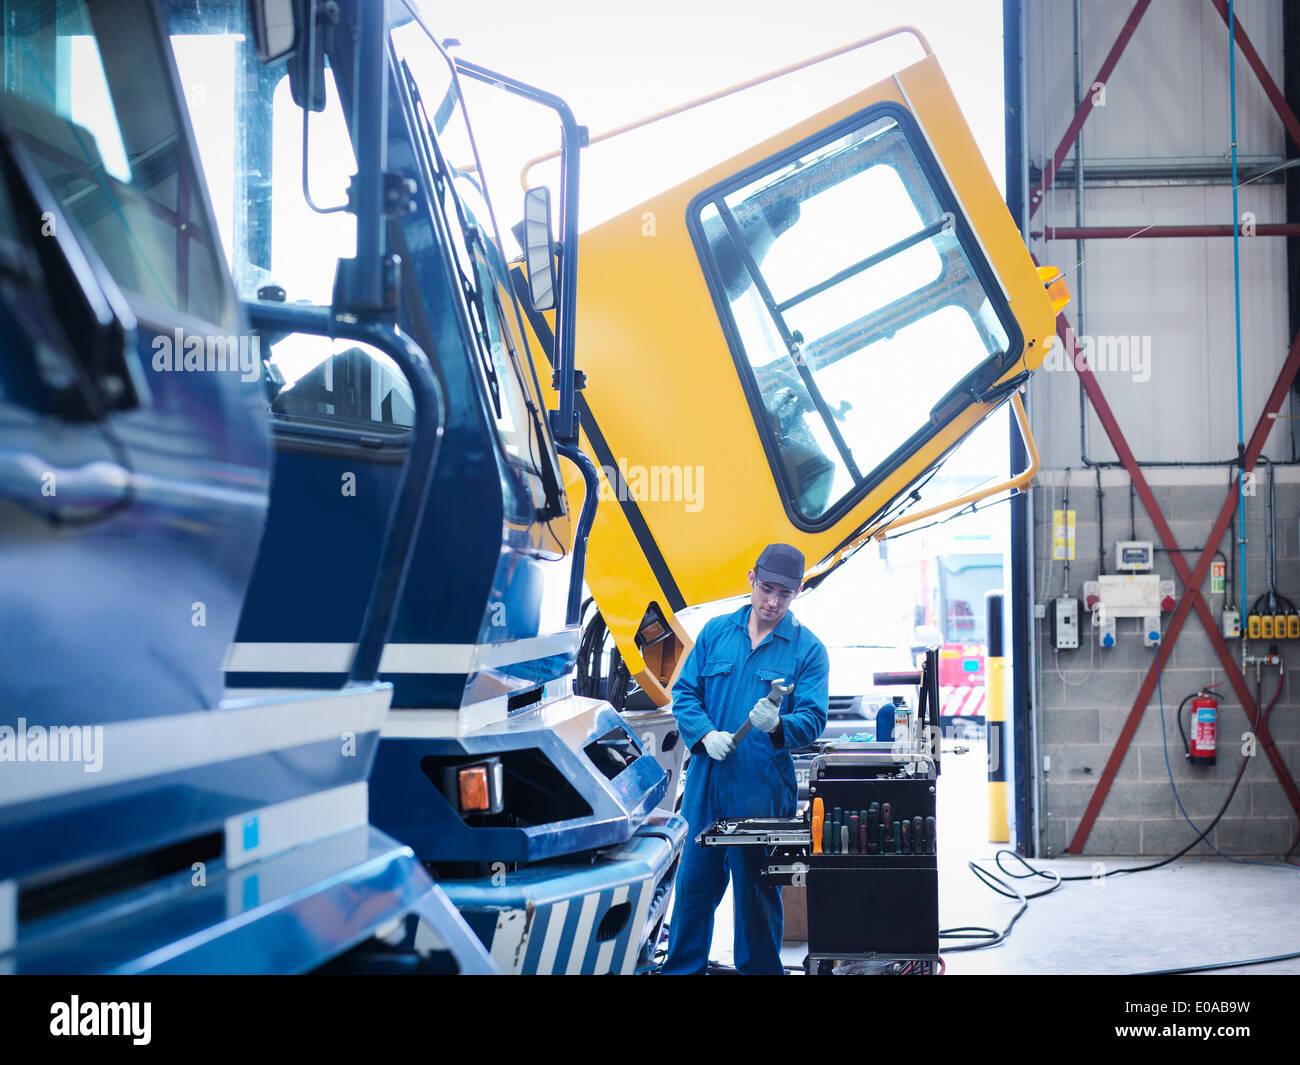 Engineer working on engine in truck repair factory - Stock Image